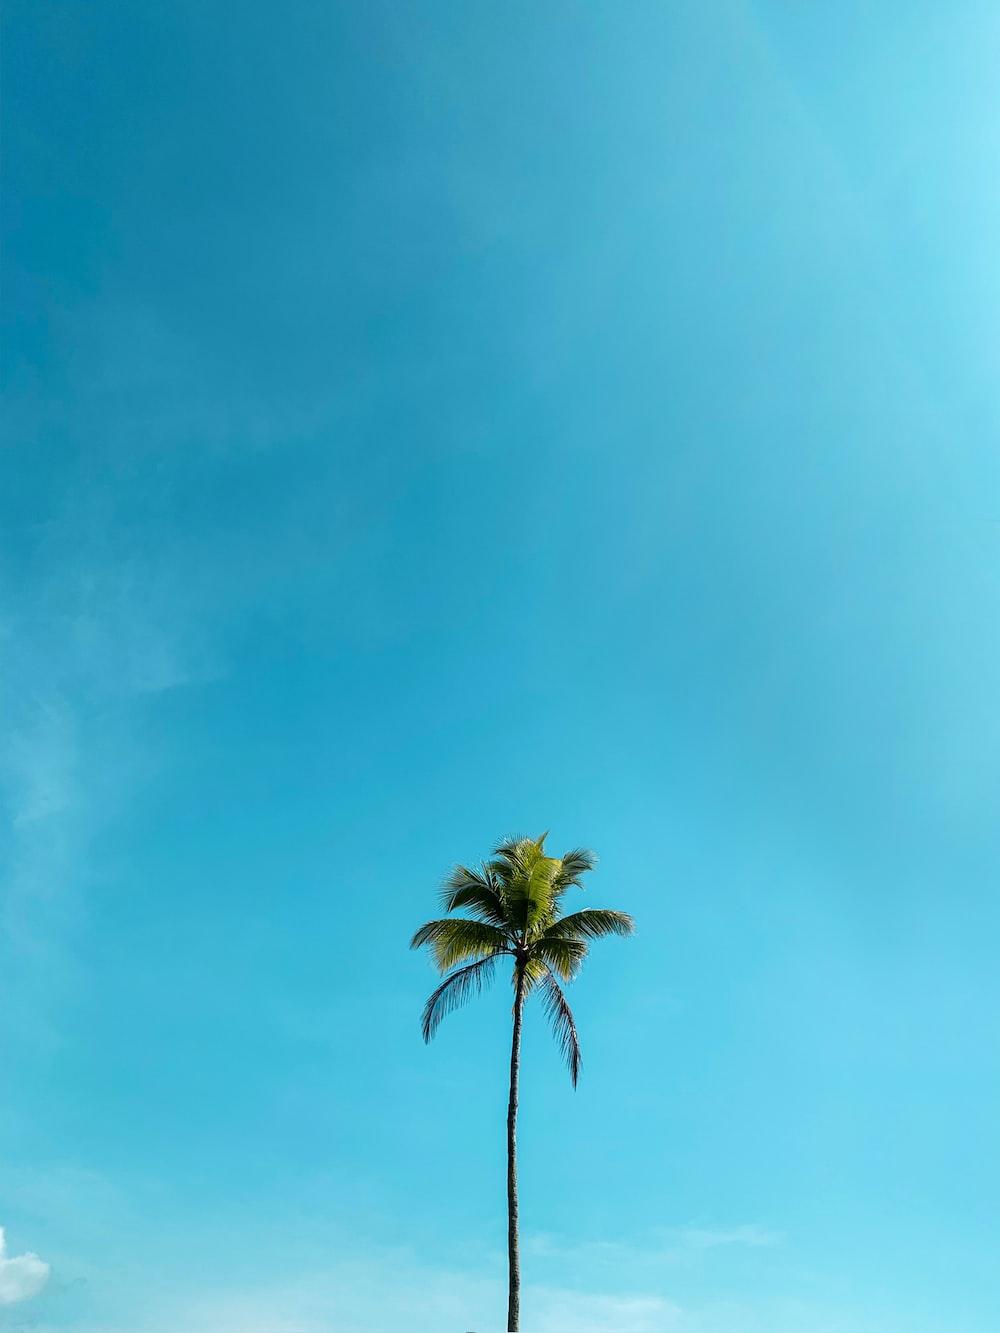 green palm tree under blue sky